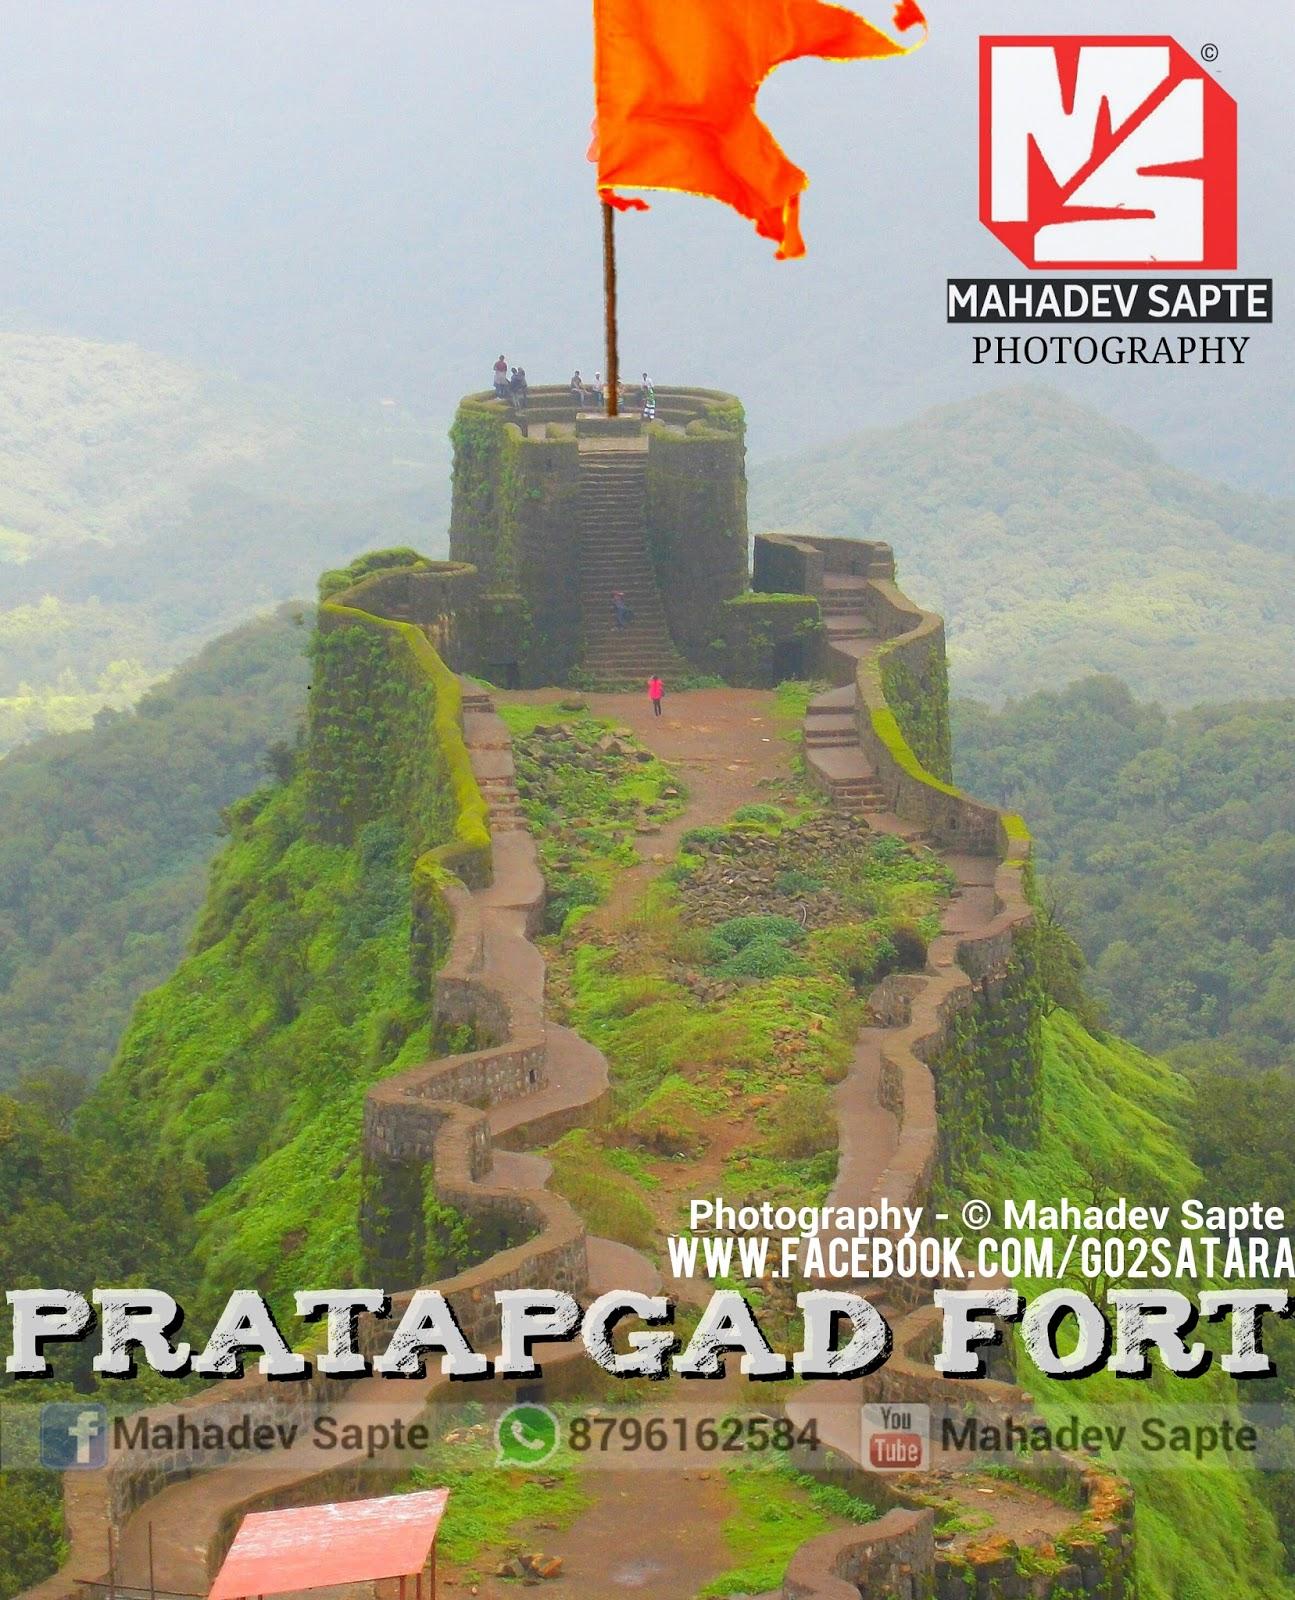 Hd wallpaper shivaji maharaj - Pratapgad Fort Shivaji Maharaj Fort